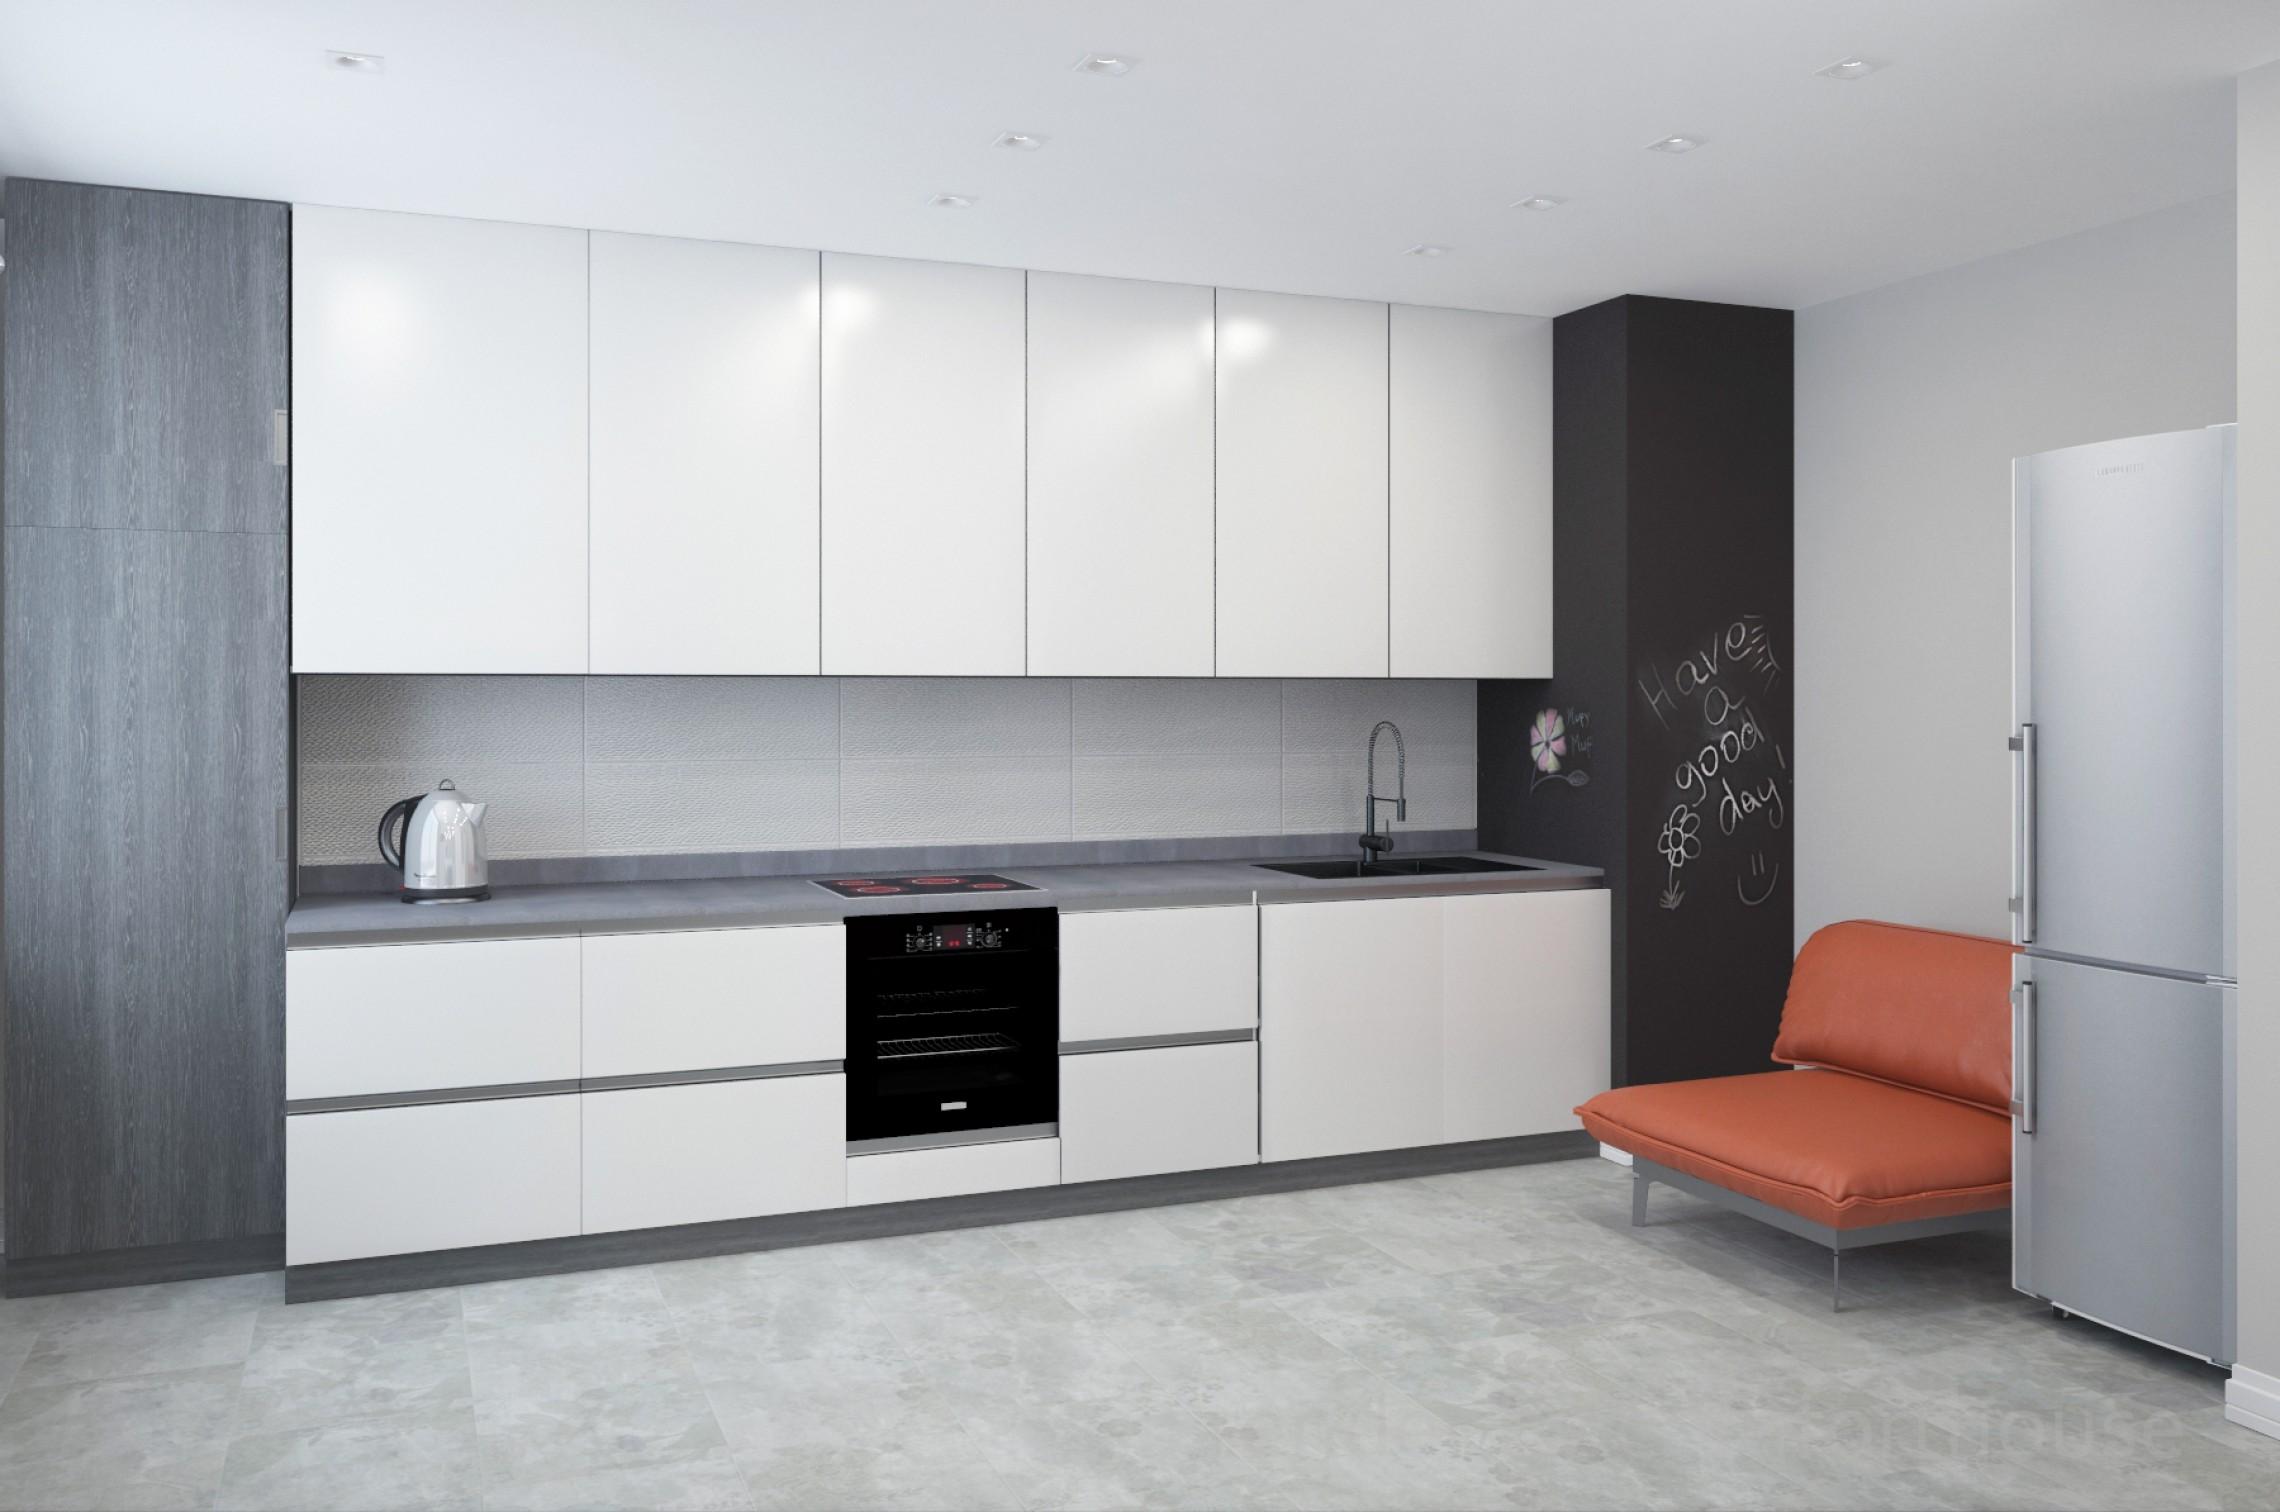 white and orange interior kitchen